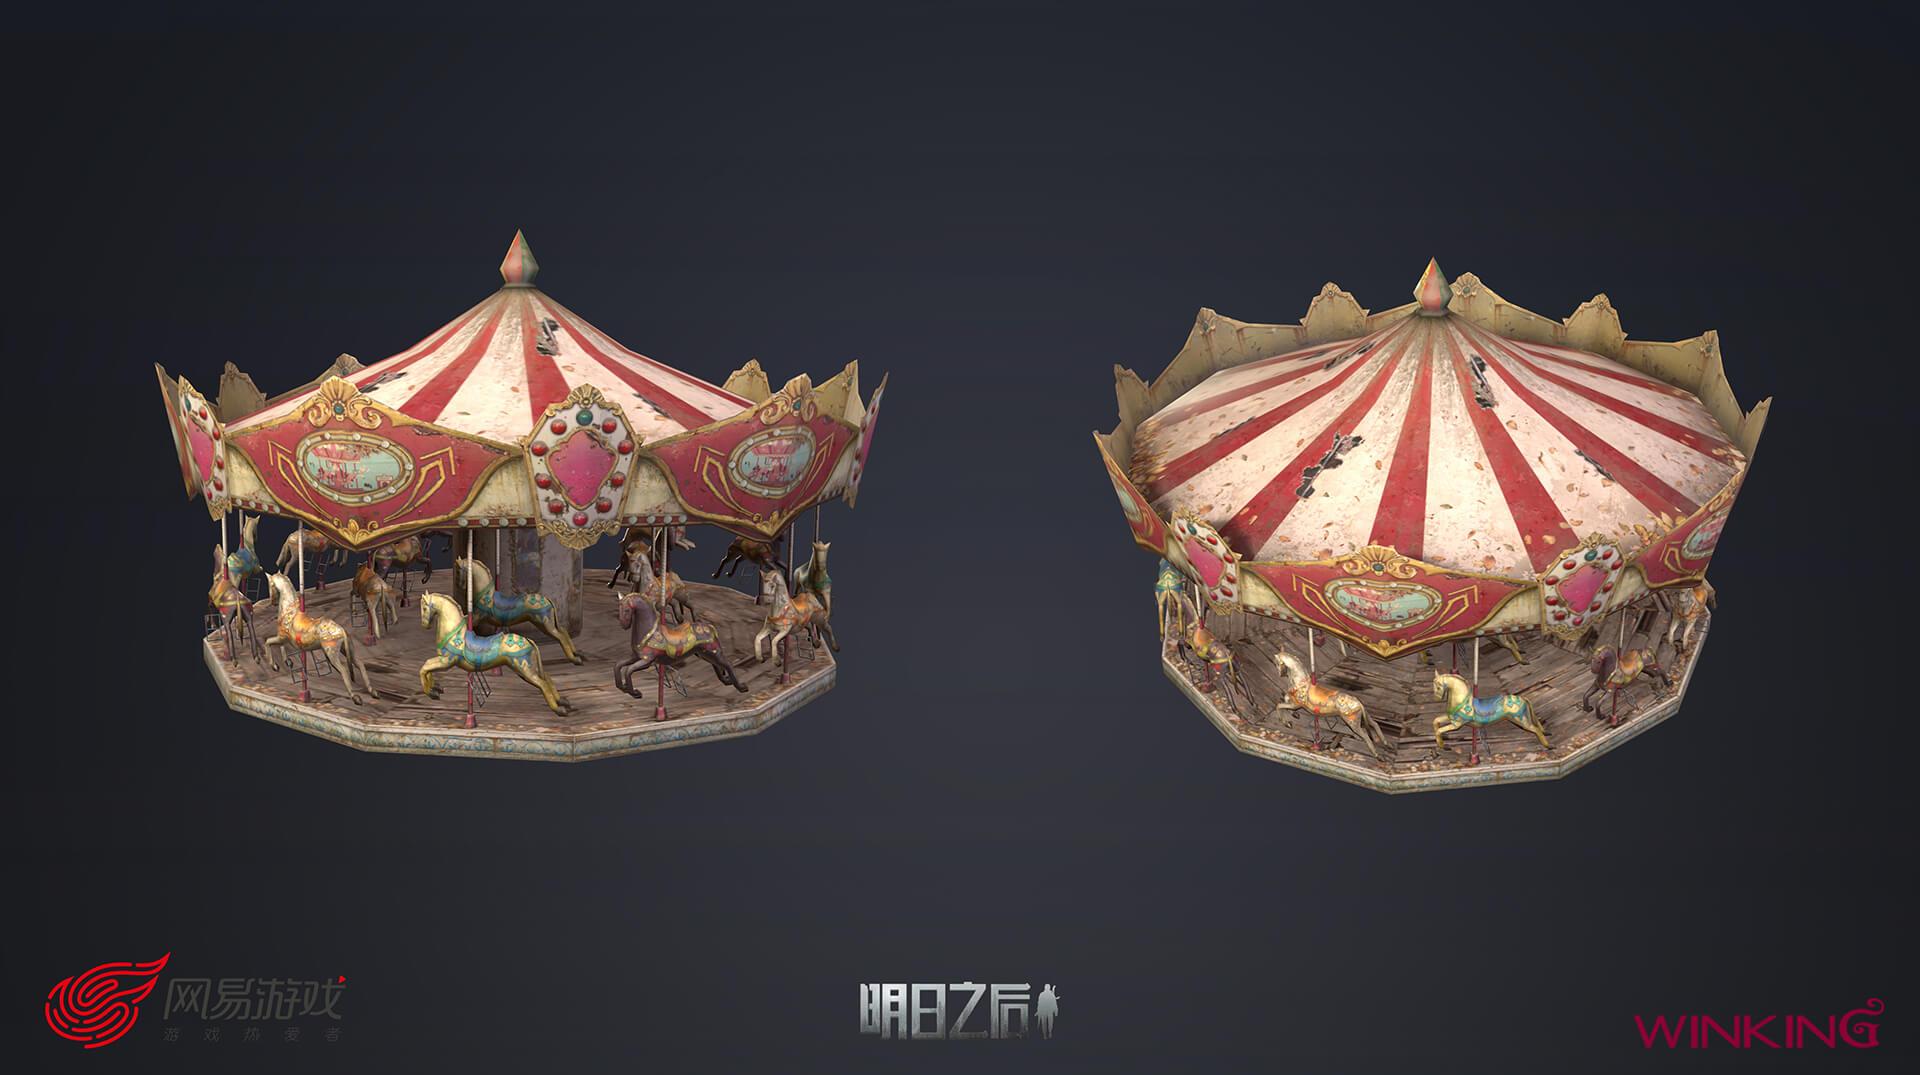 LifeAfter - 3D 모델링